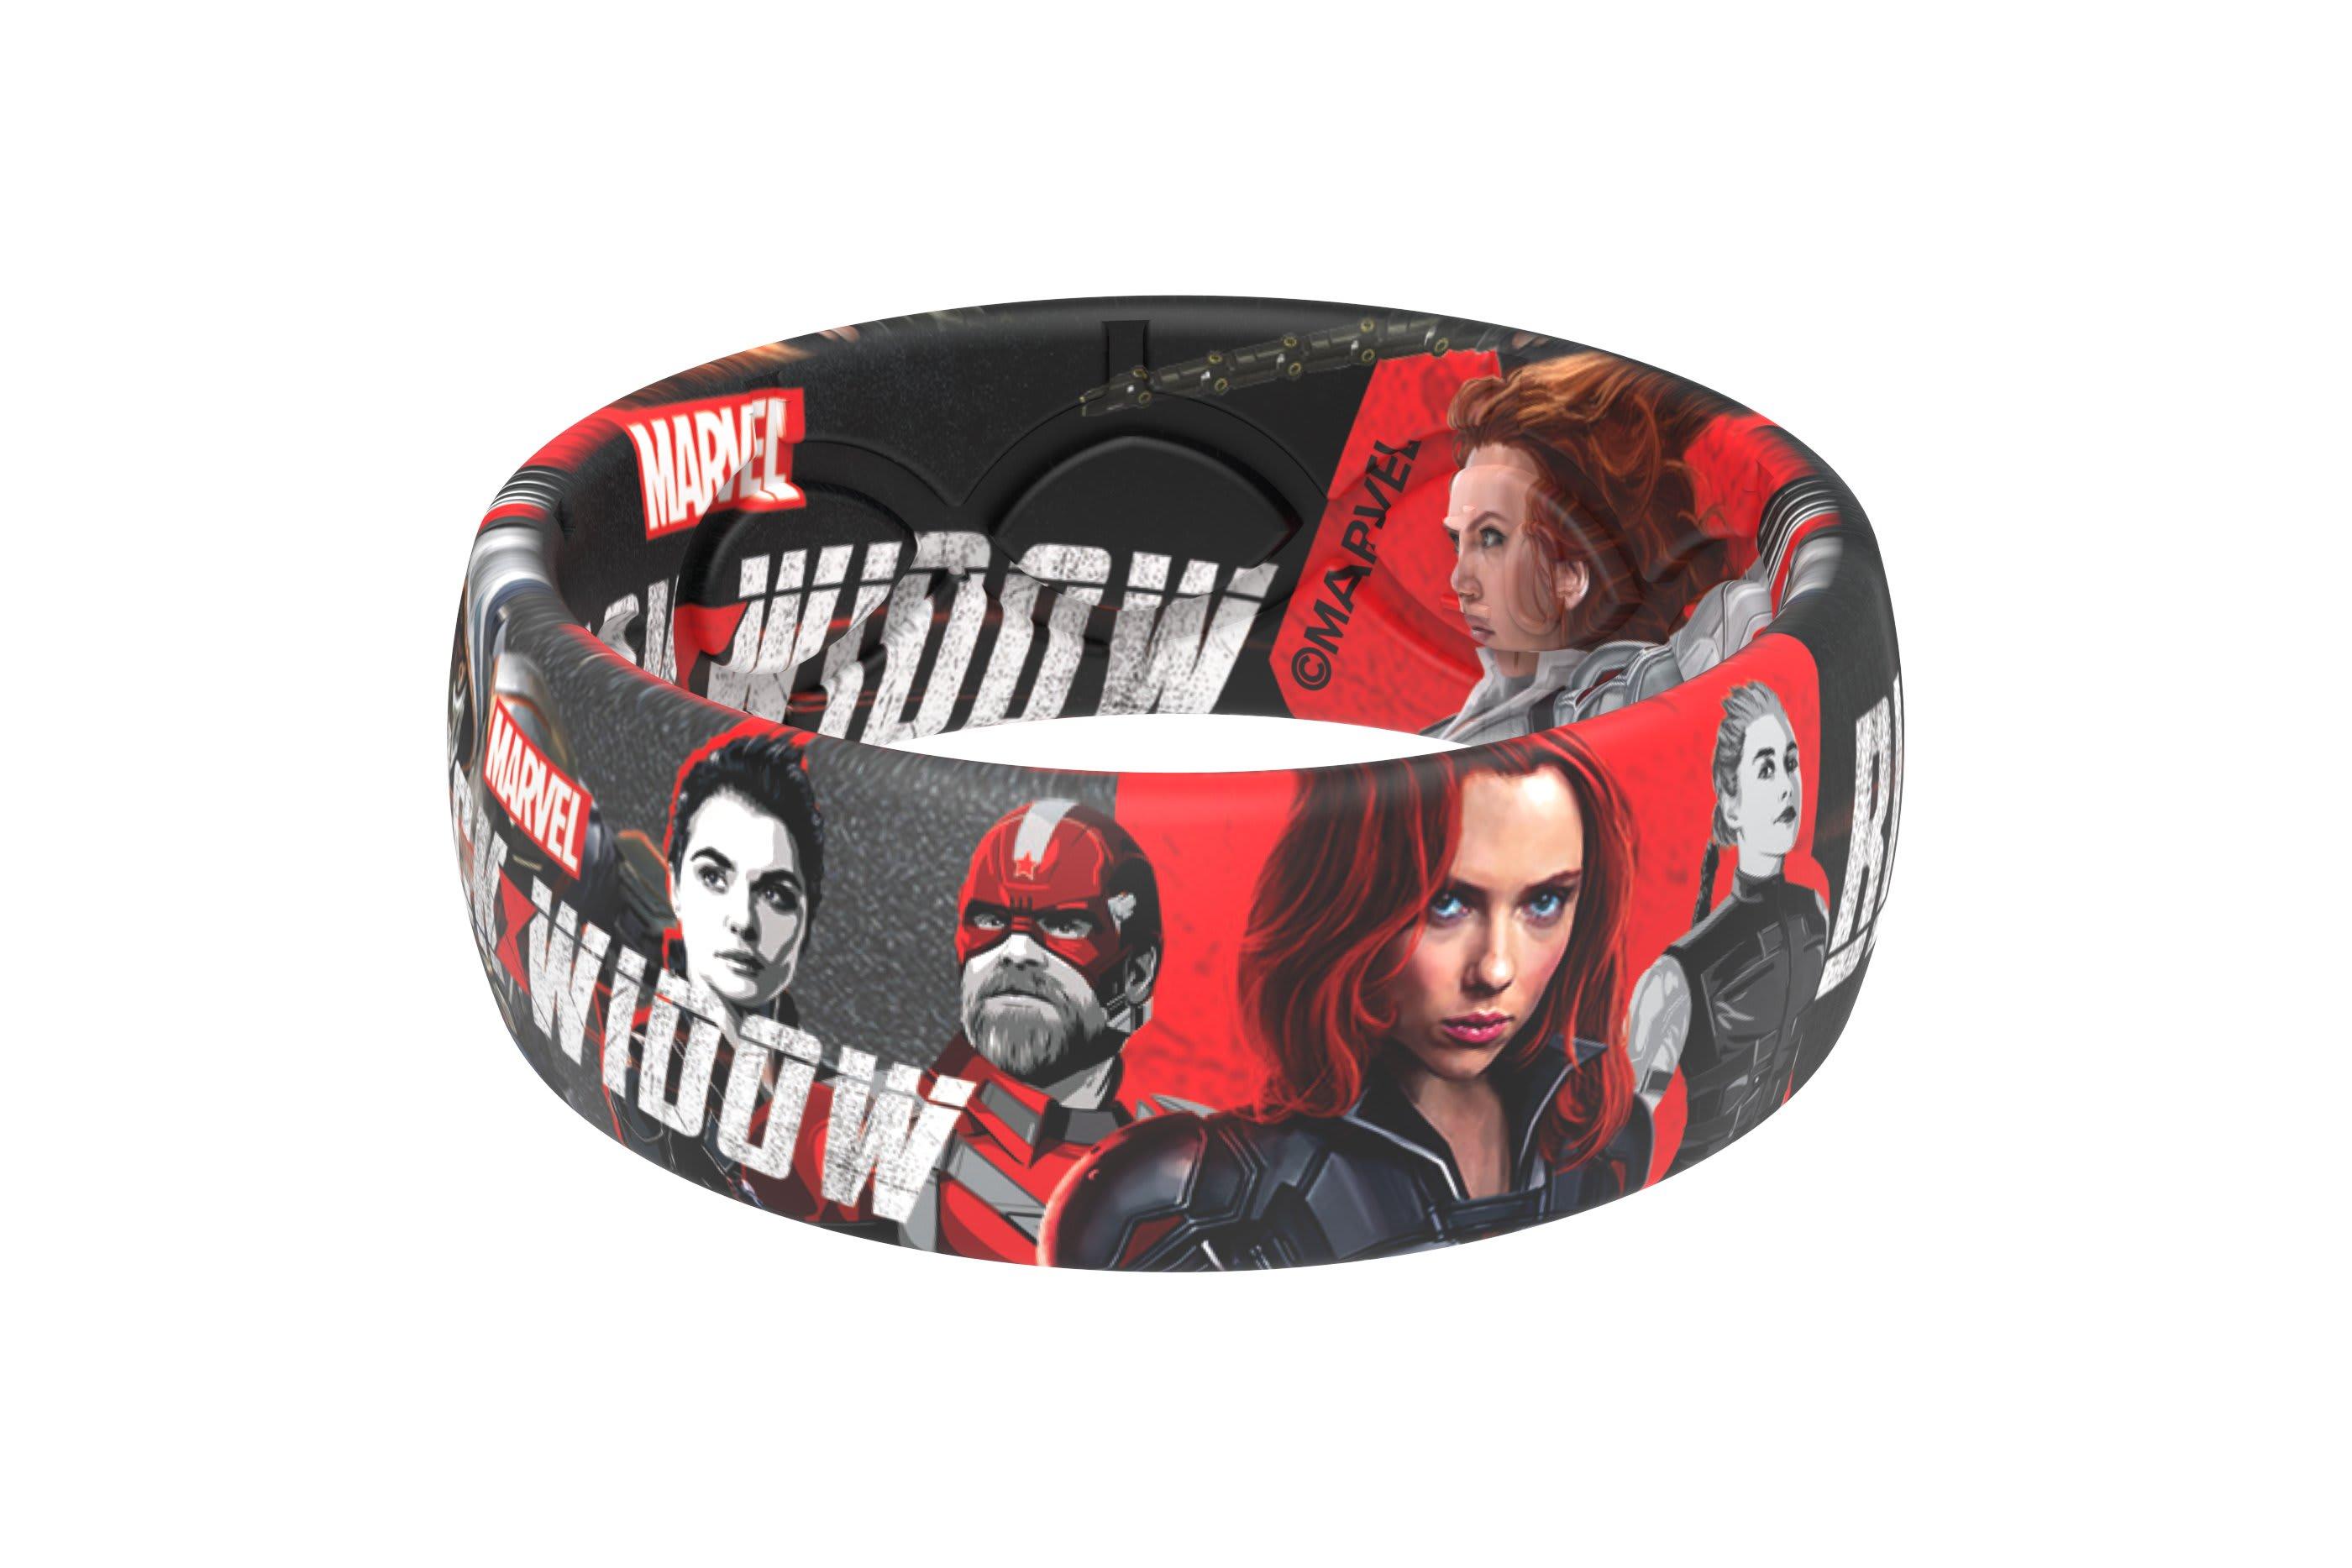 Black Widow - Natasha Ring Viewed From Side